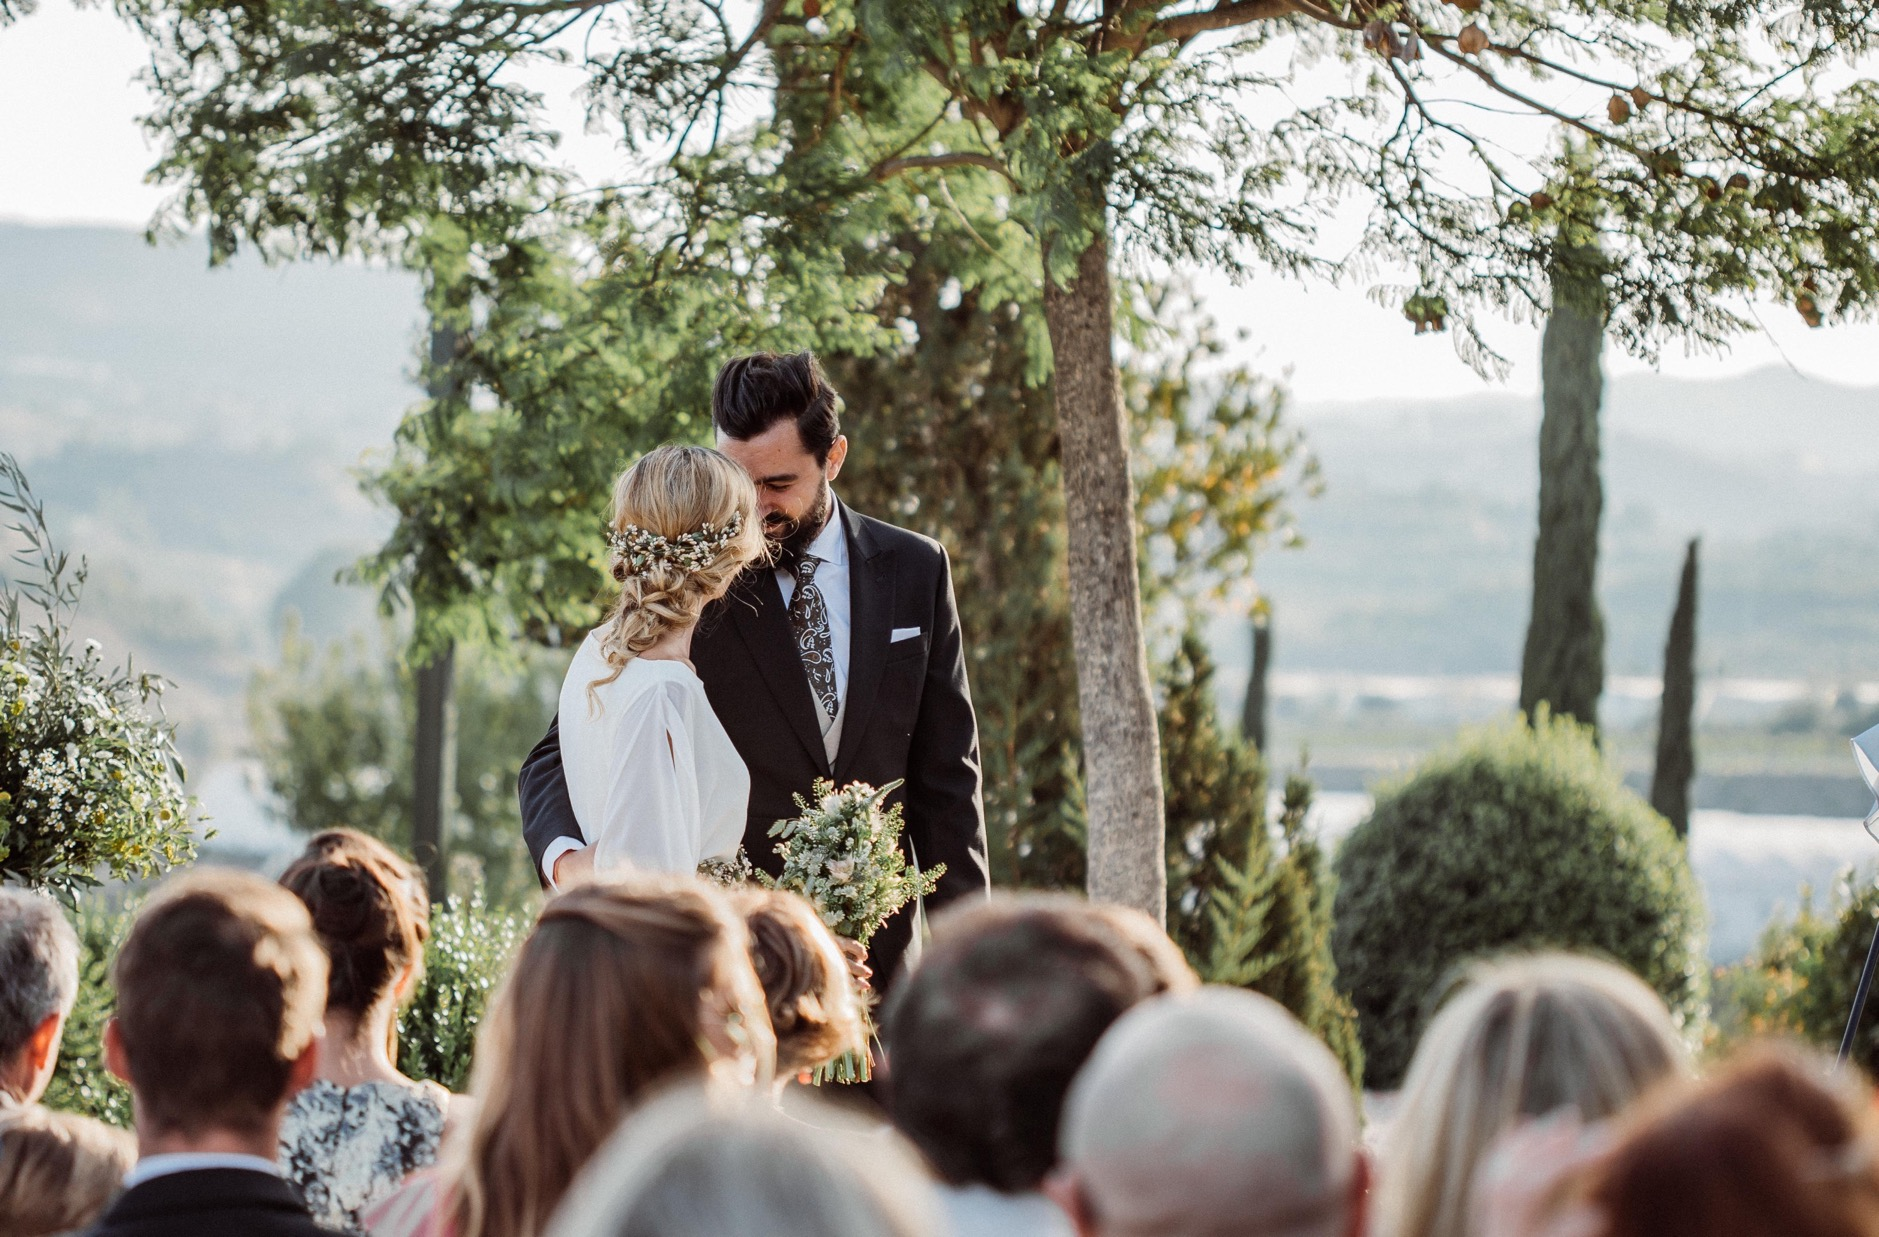 Si-Quiero-Wedding-Planner-By-Sira-Antequera-Bodas-Málaga-Marbella-Miami- Ana-Aitor-2